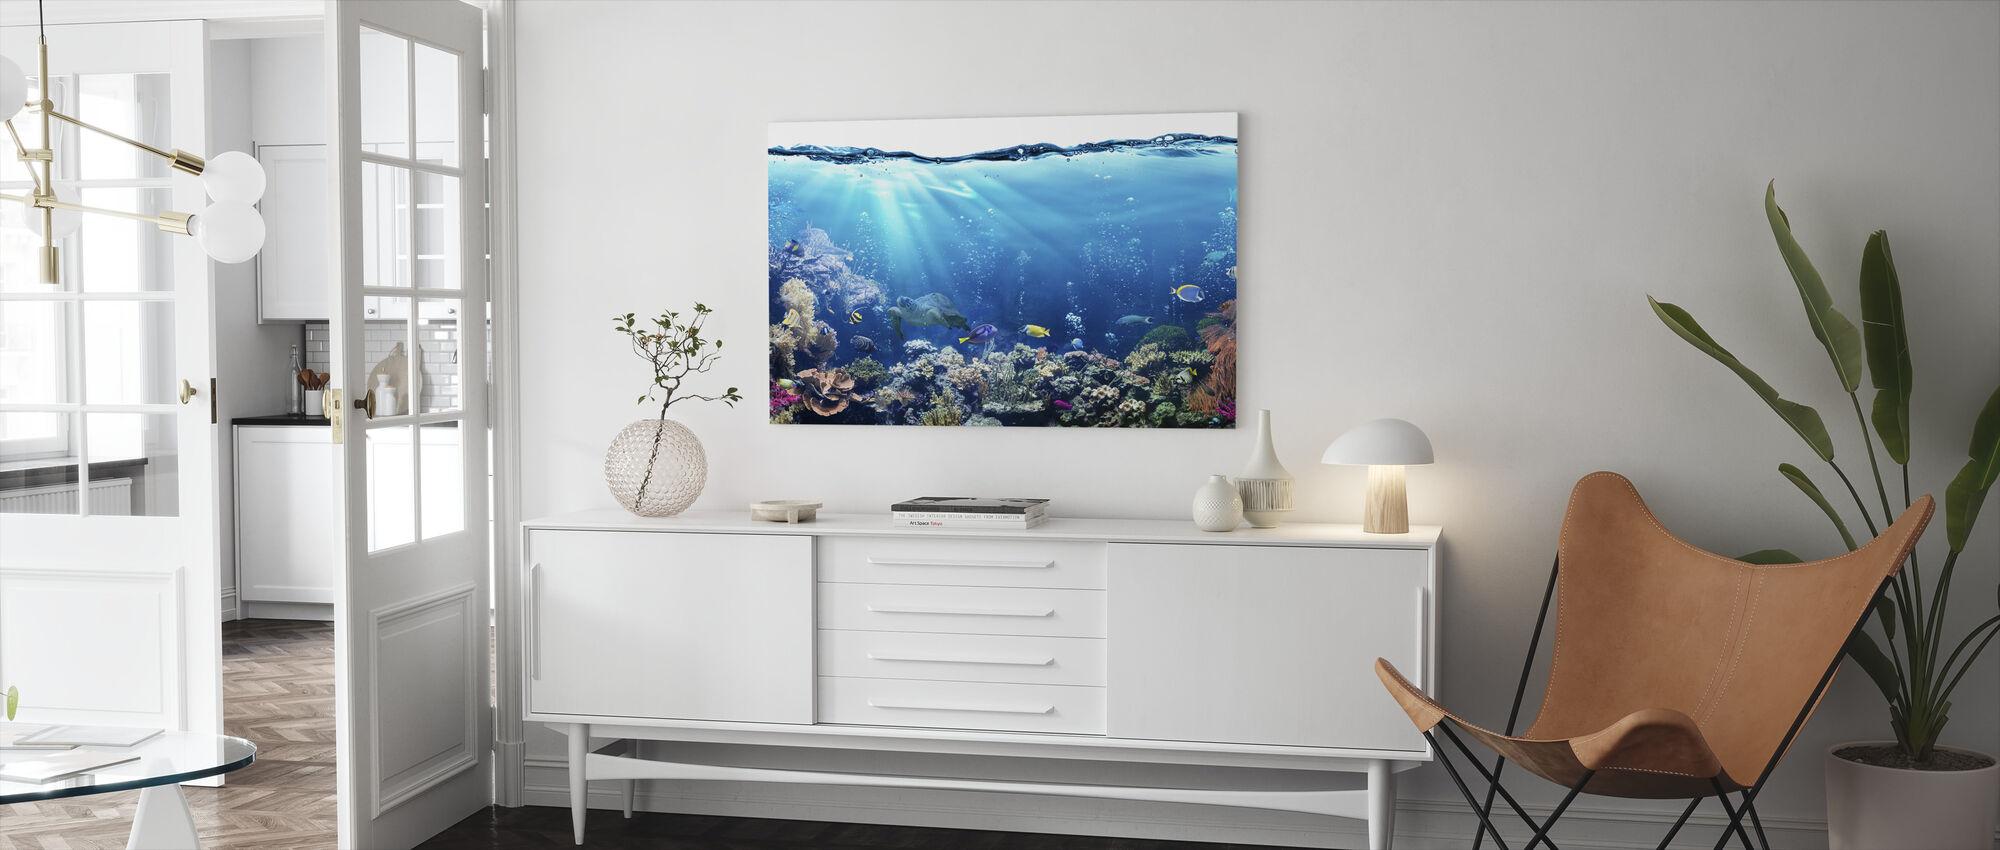 Underwater Scene - Canvas print - Living Room